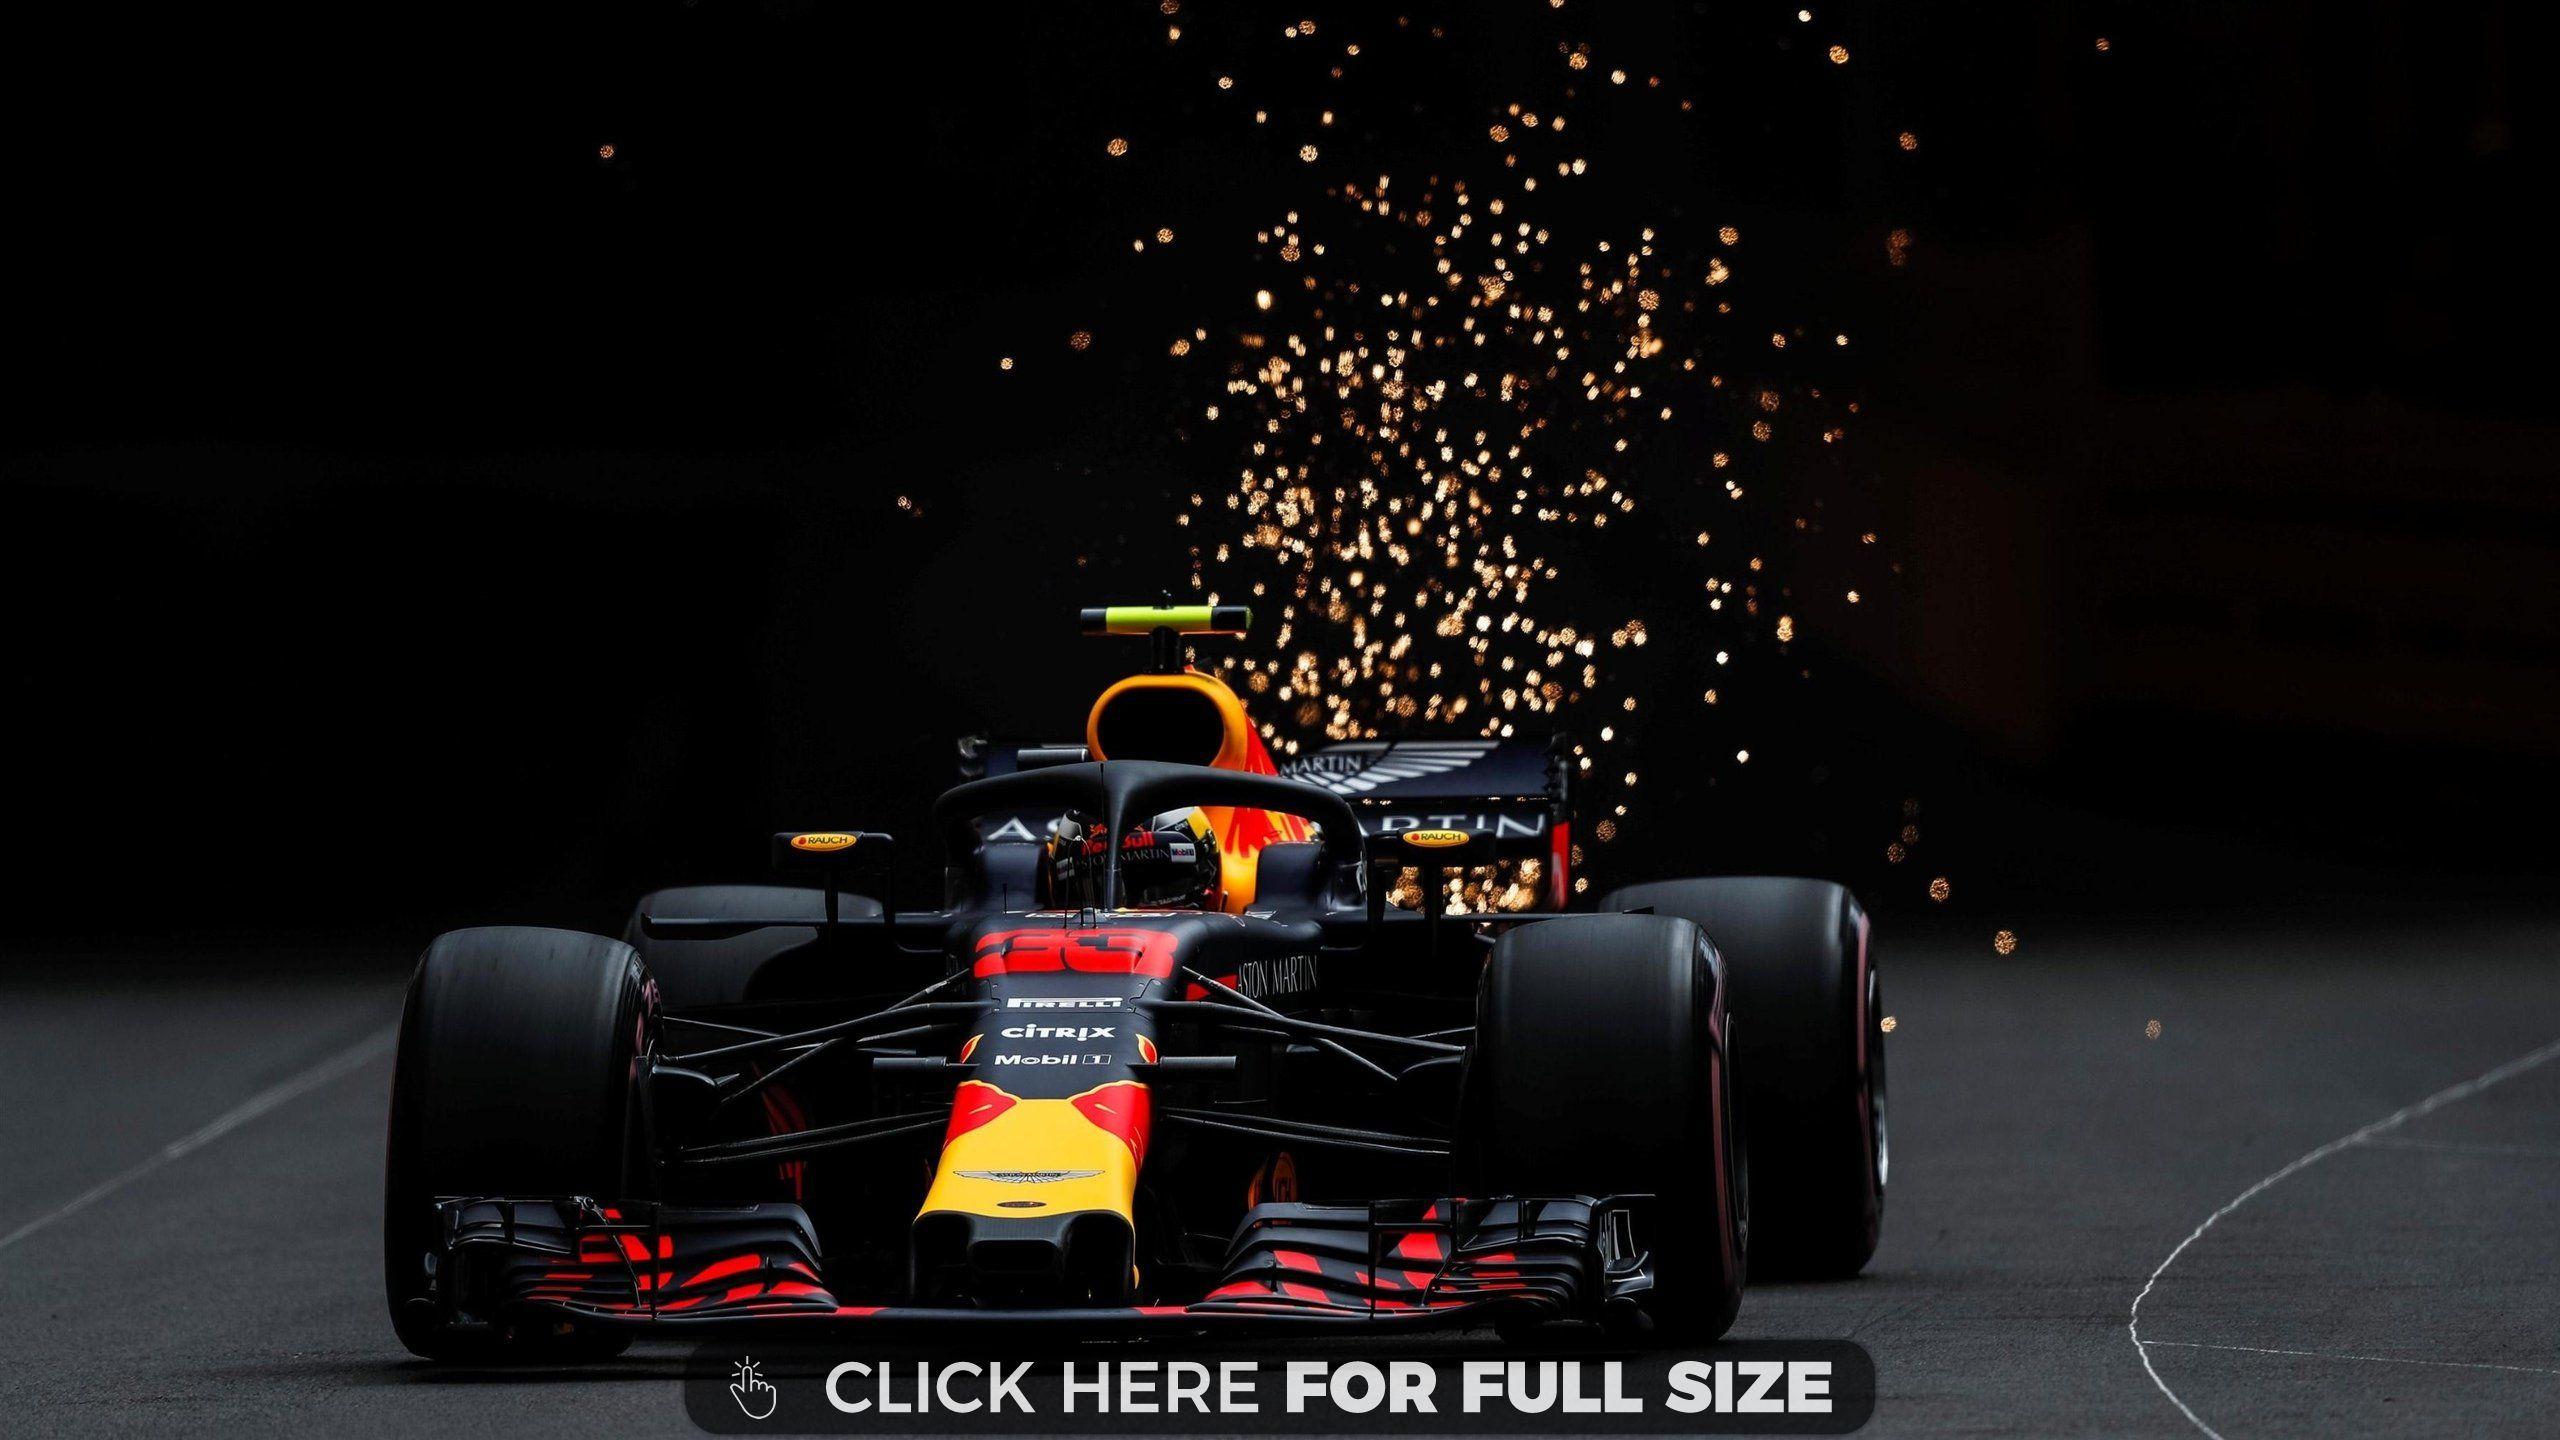 Monaco Gp Max Verstappen Hd Wallpaper Red Bull Racing Formula 1 Wallpaper F1 Wallpaper